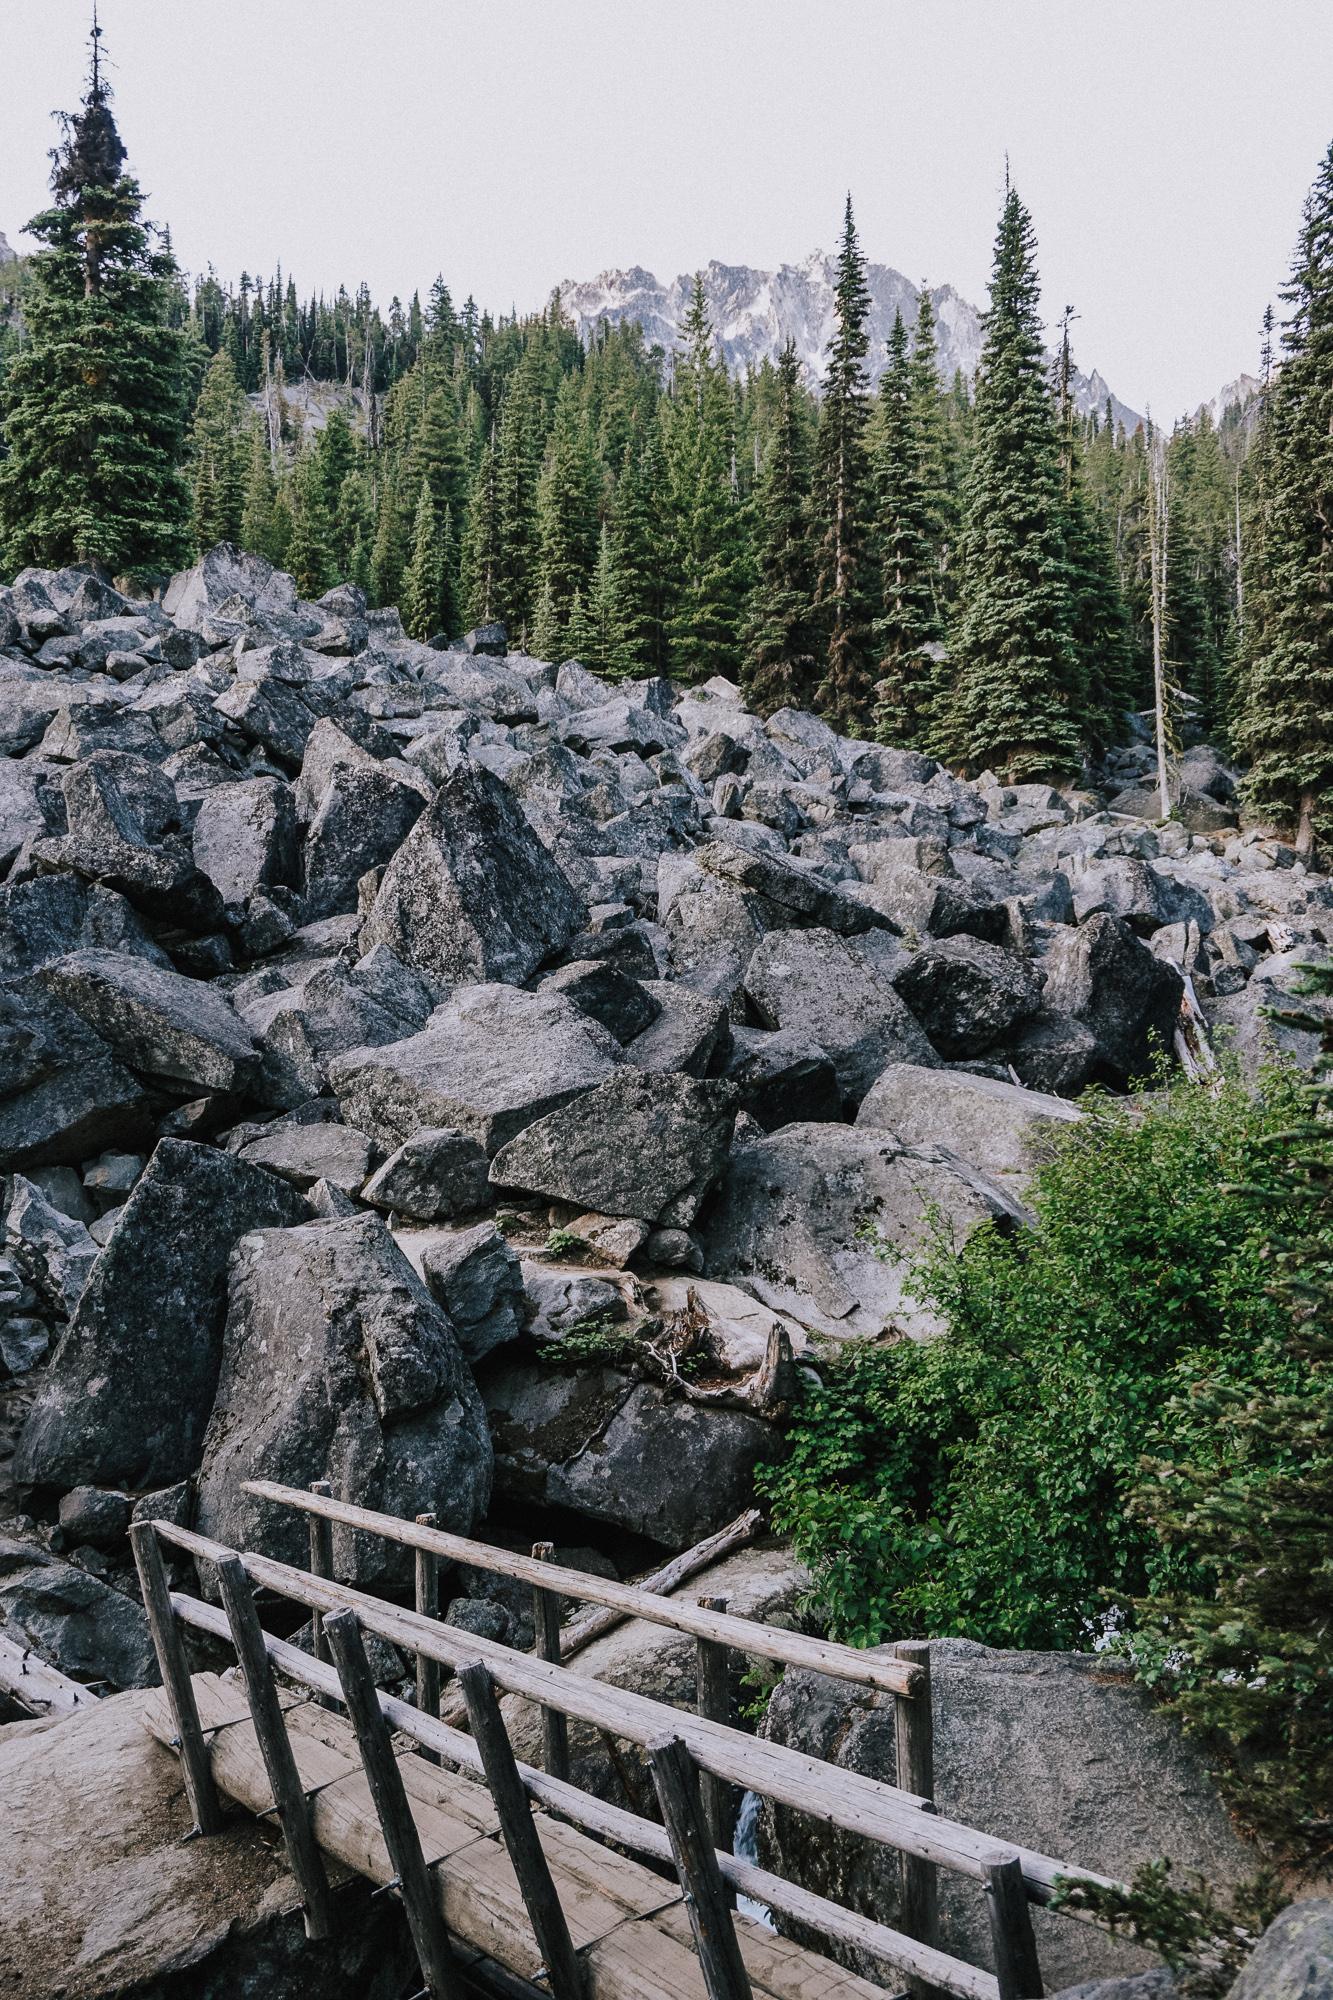 The Enchantments Alpine Lake Wilderness